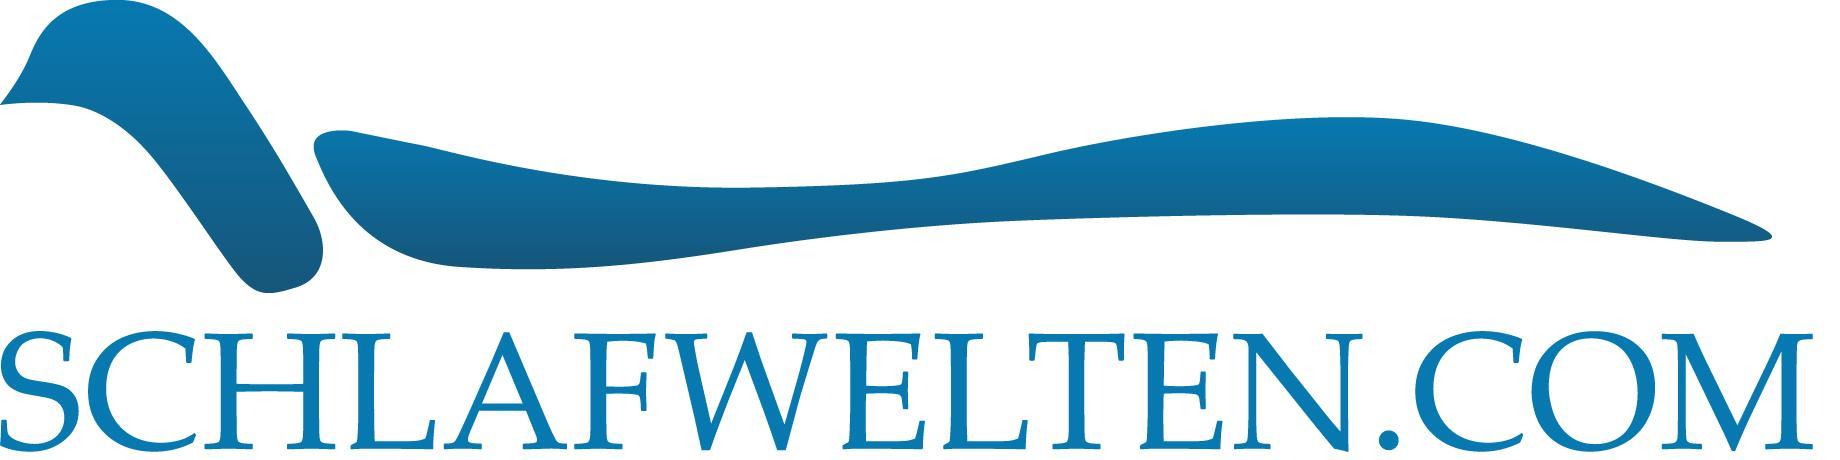 schlafwelten.com- Logo - Bewertungen